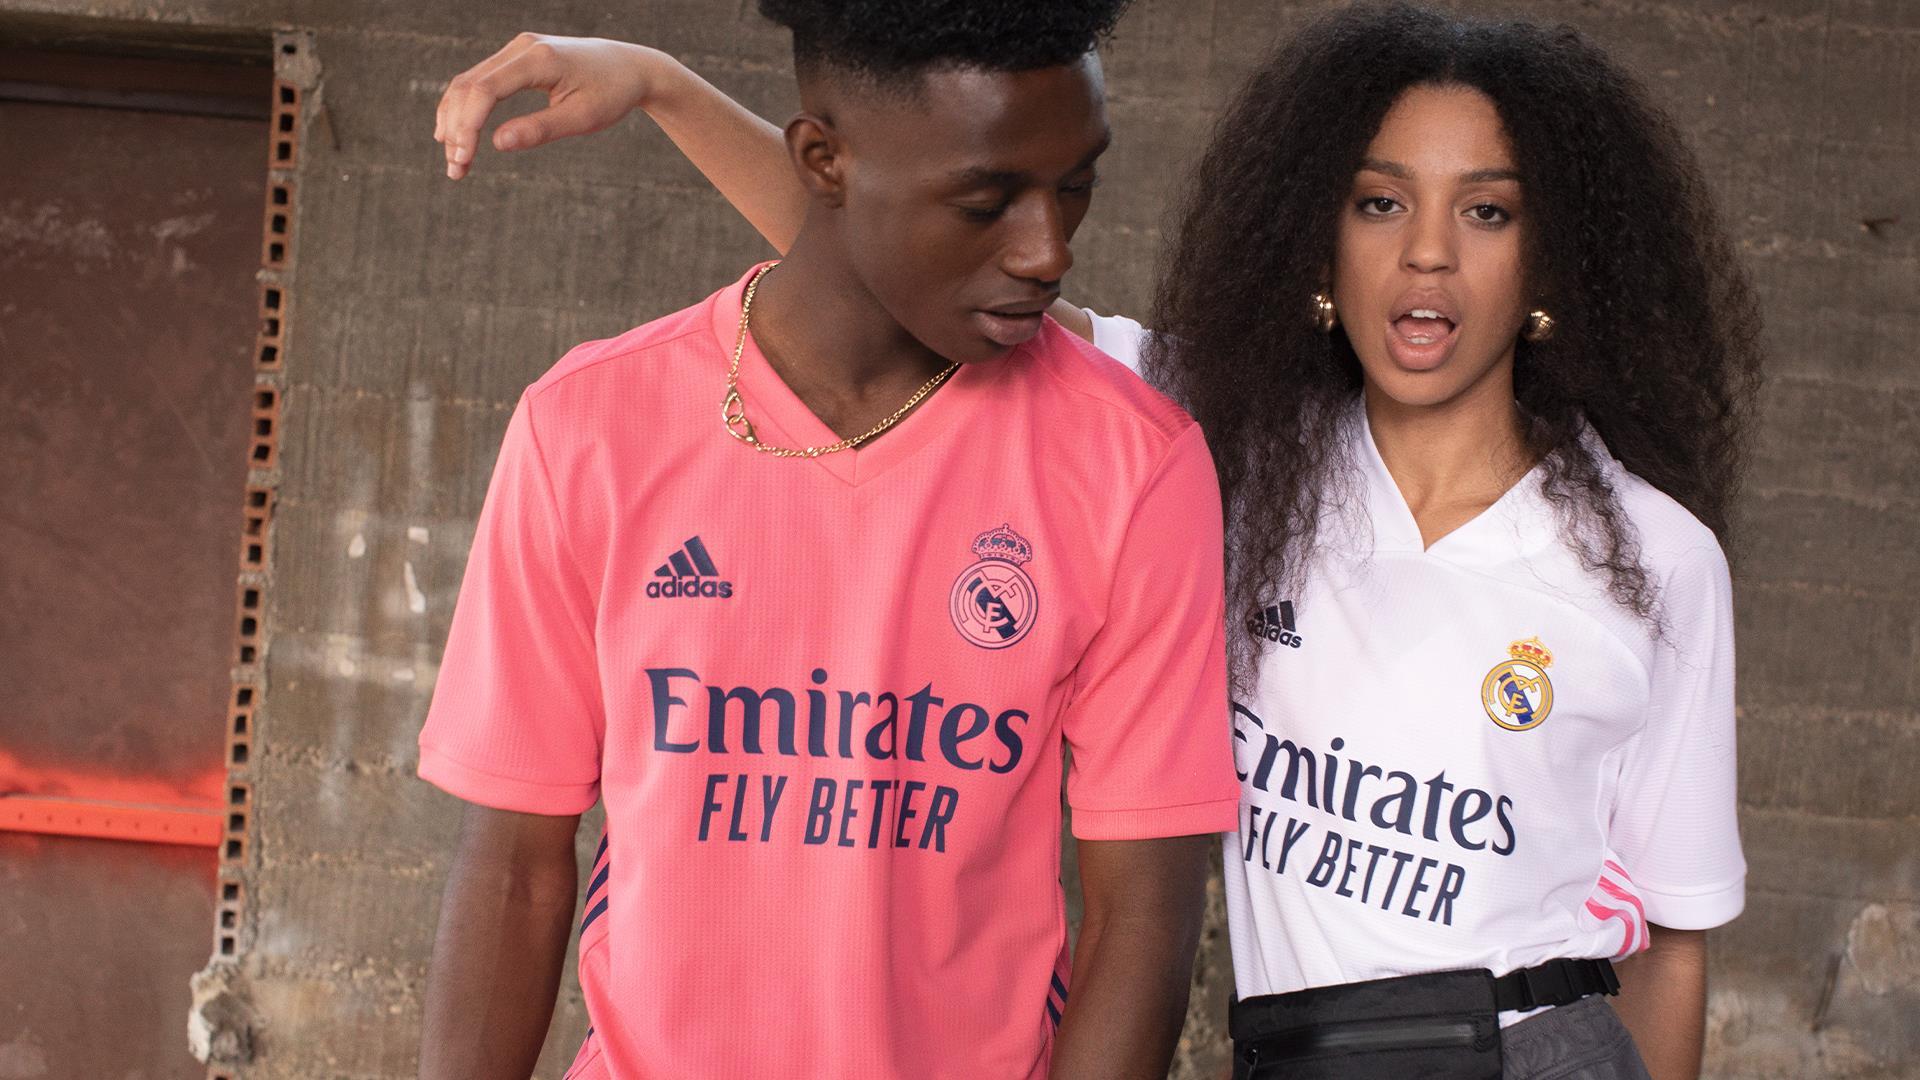 Le nuove maglie del Real Madrid 2020-2021